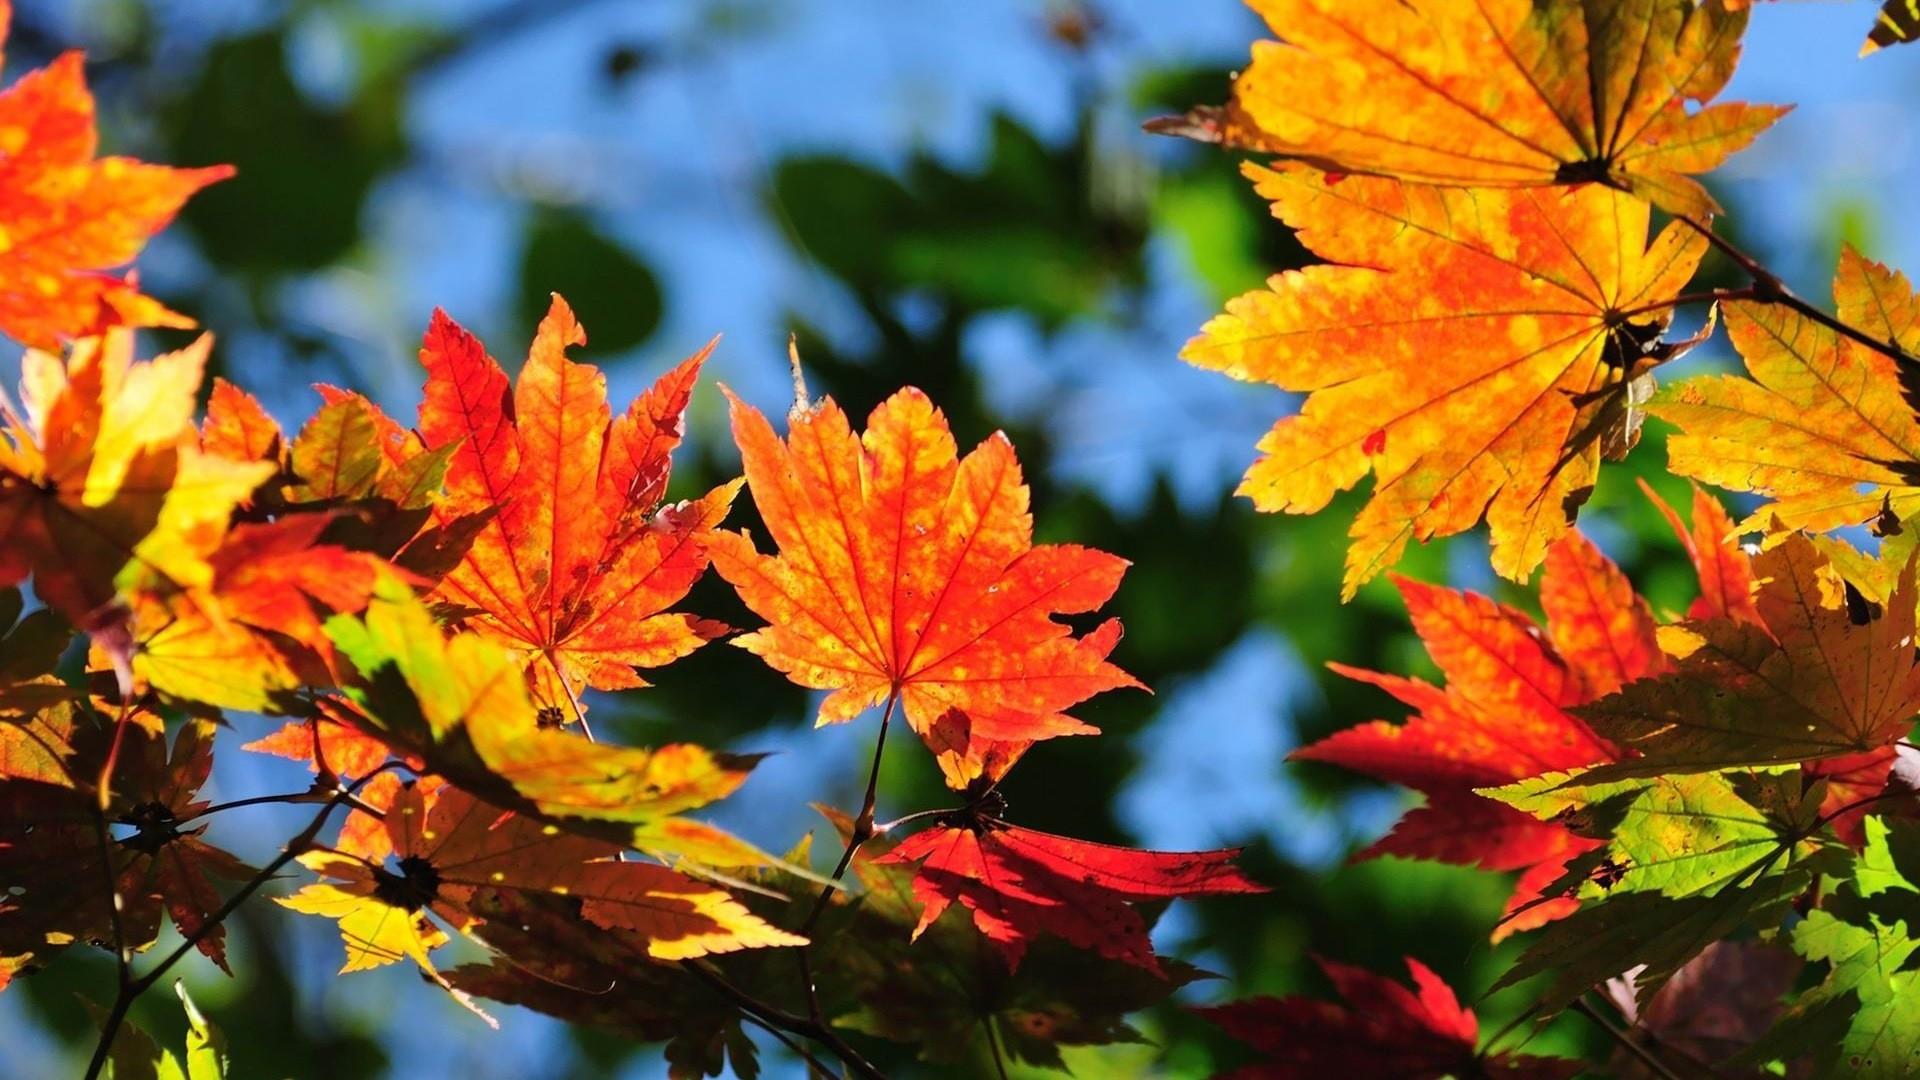 Windows 8.1 Theme HD wallpapers: beautiful autumn leaves #8 – 1920×1080.